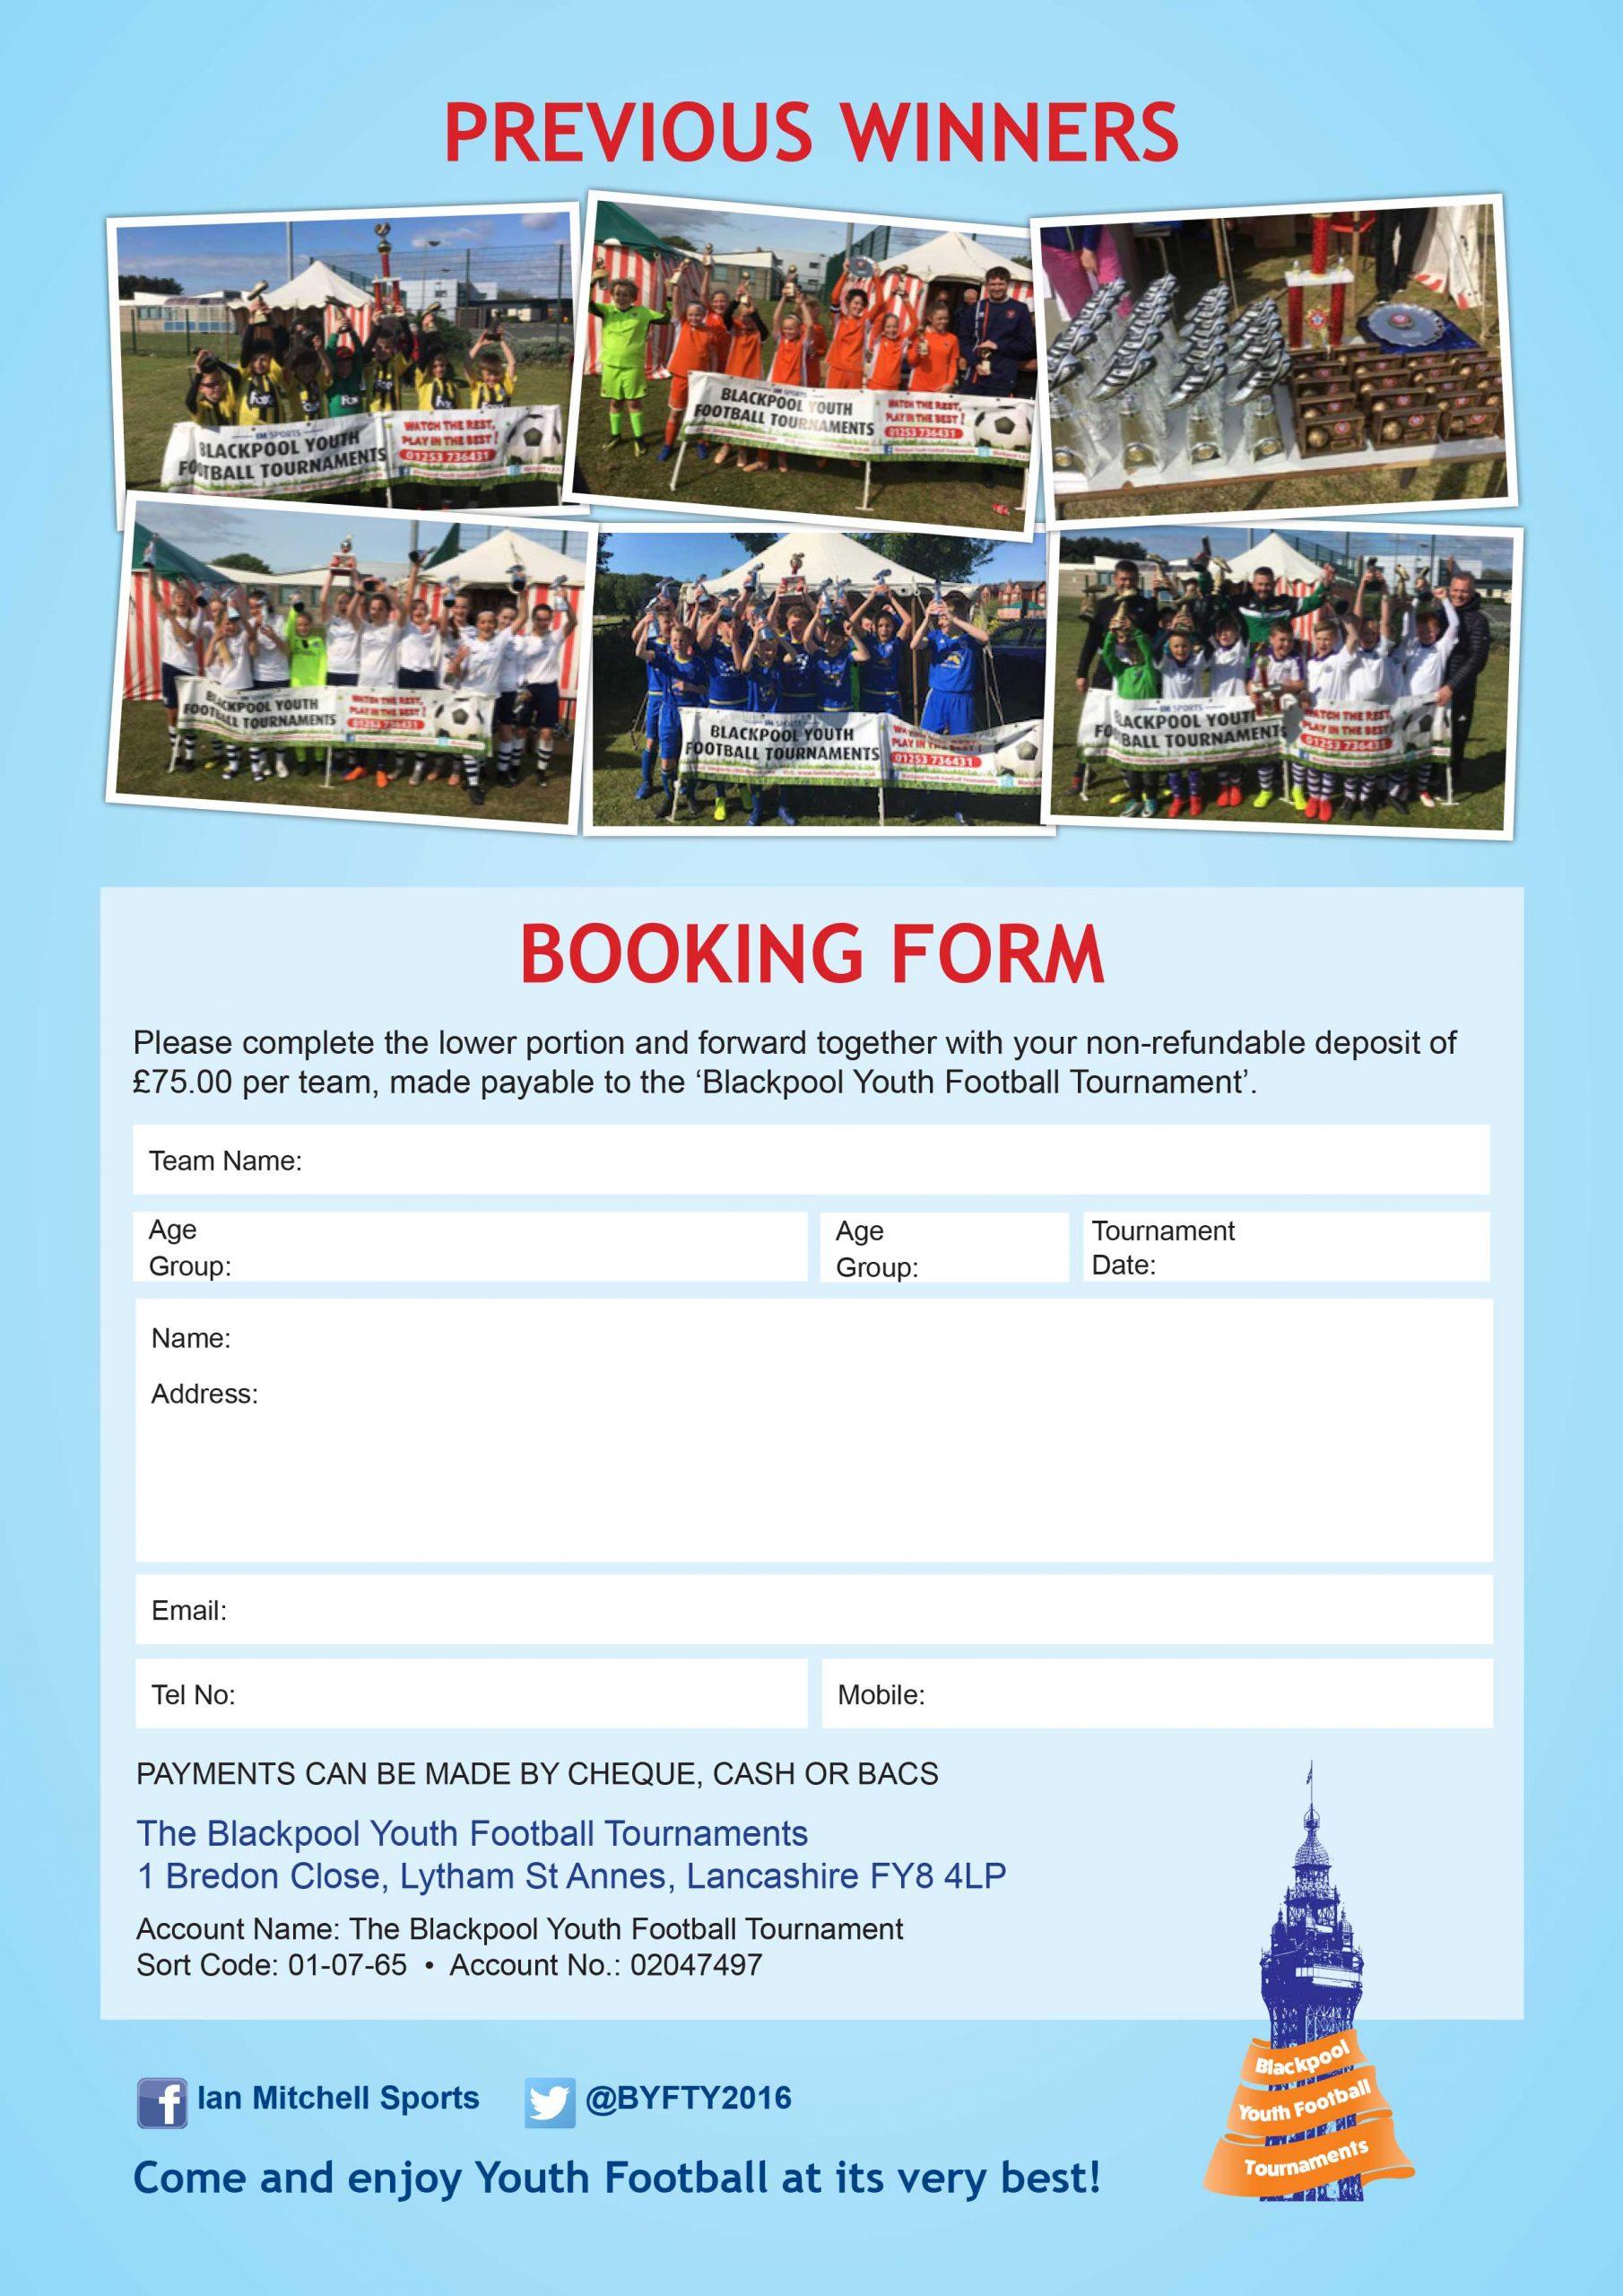 Football Festivals Booking Form 2022 - Blackpool Football Tournaments